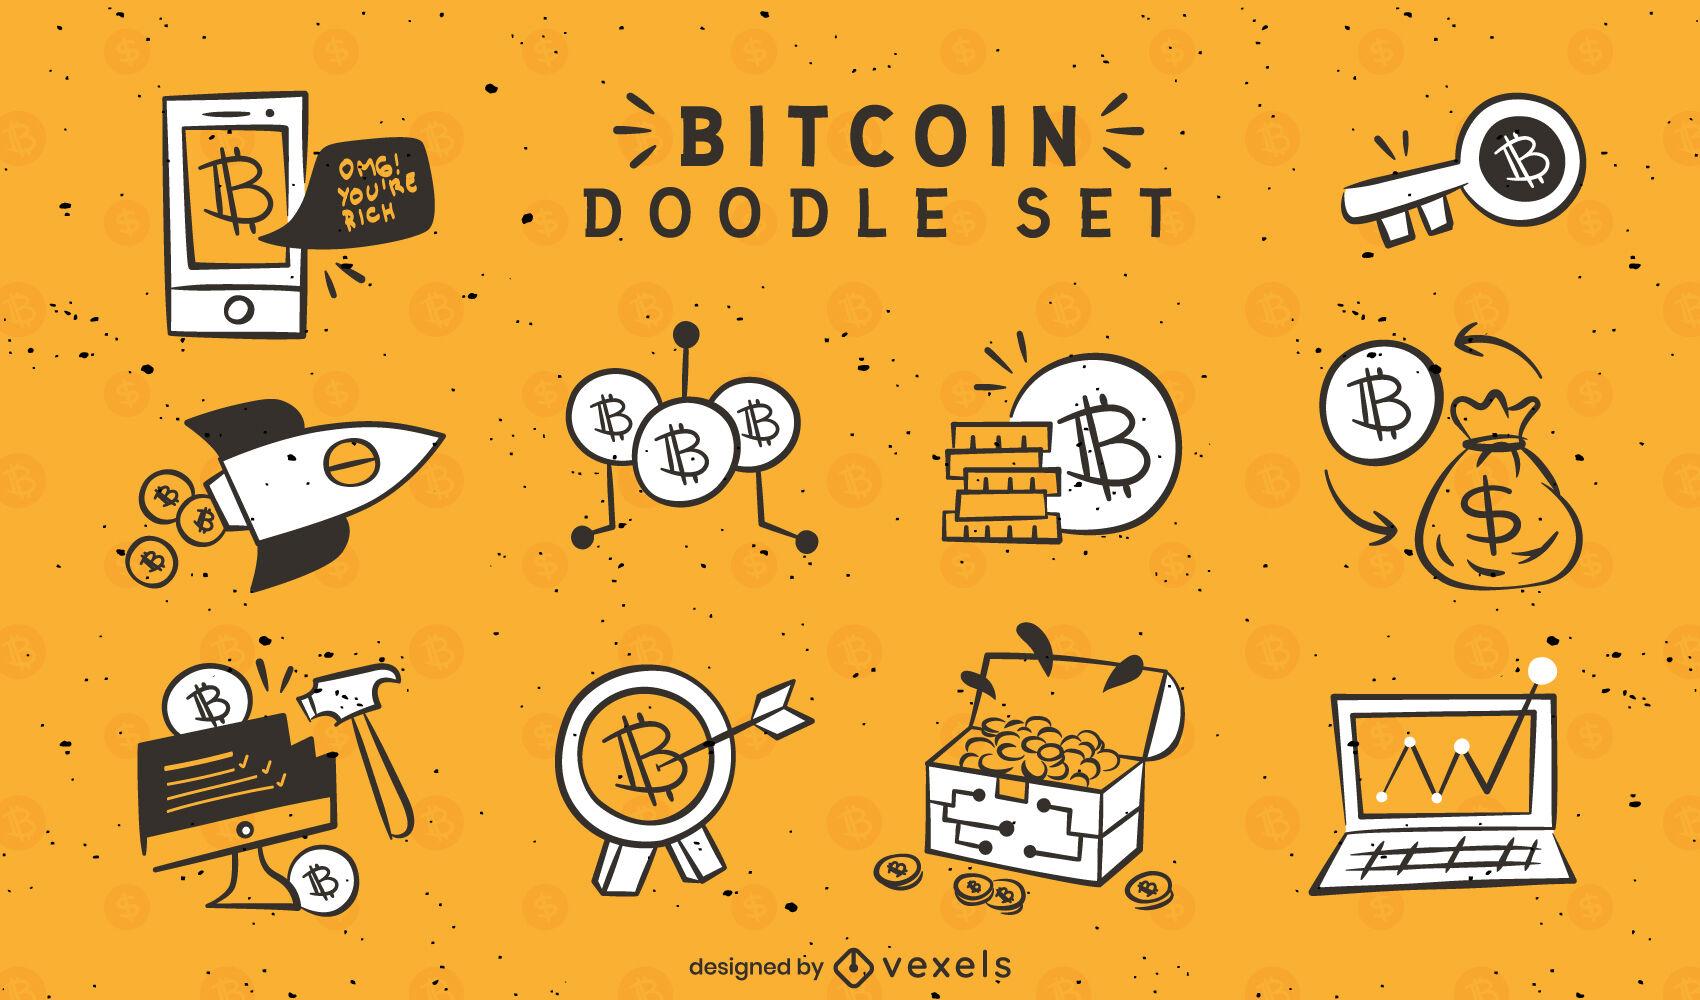 Bitcoin doodle set of elements